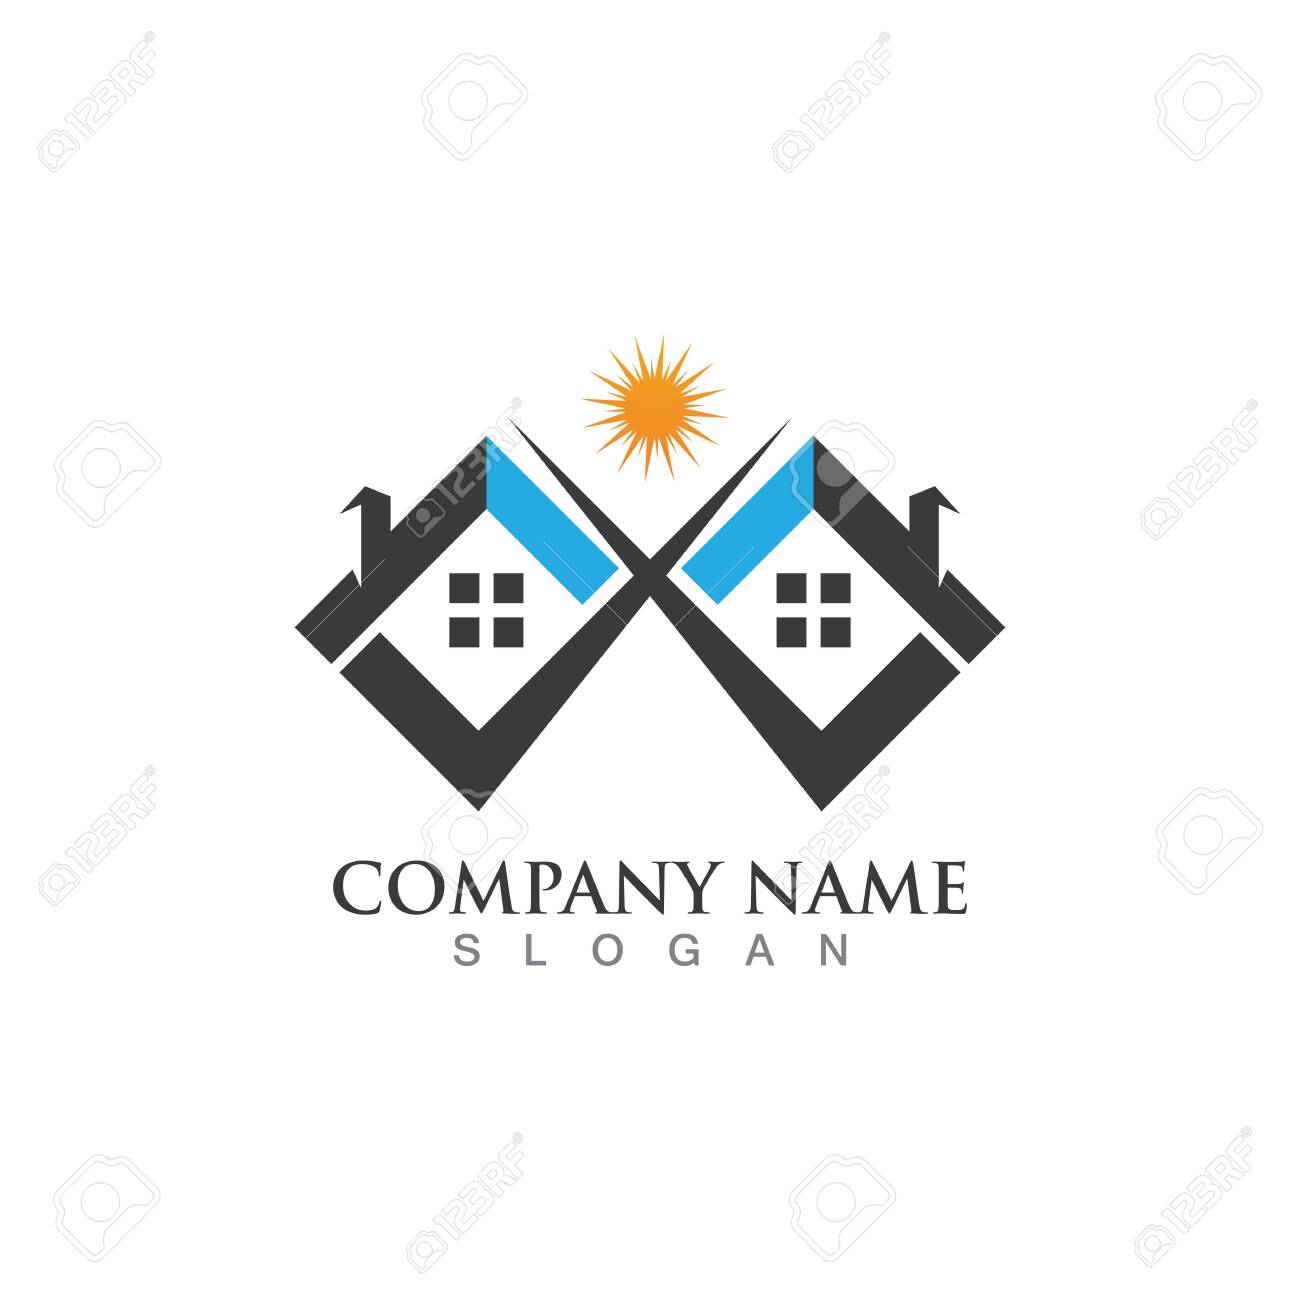 Home Logo And Symbol Property And Construction Logo Design